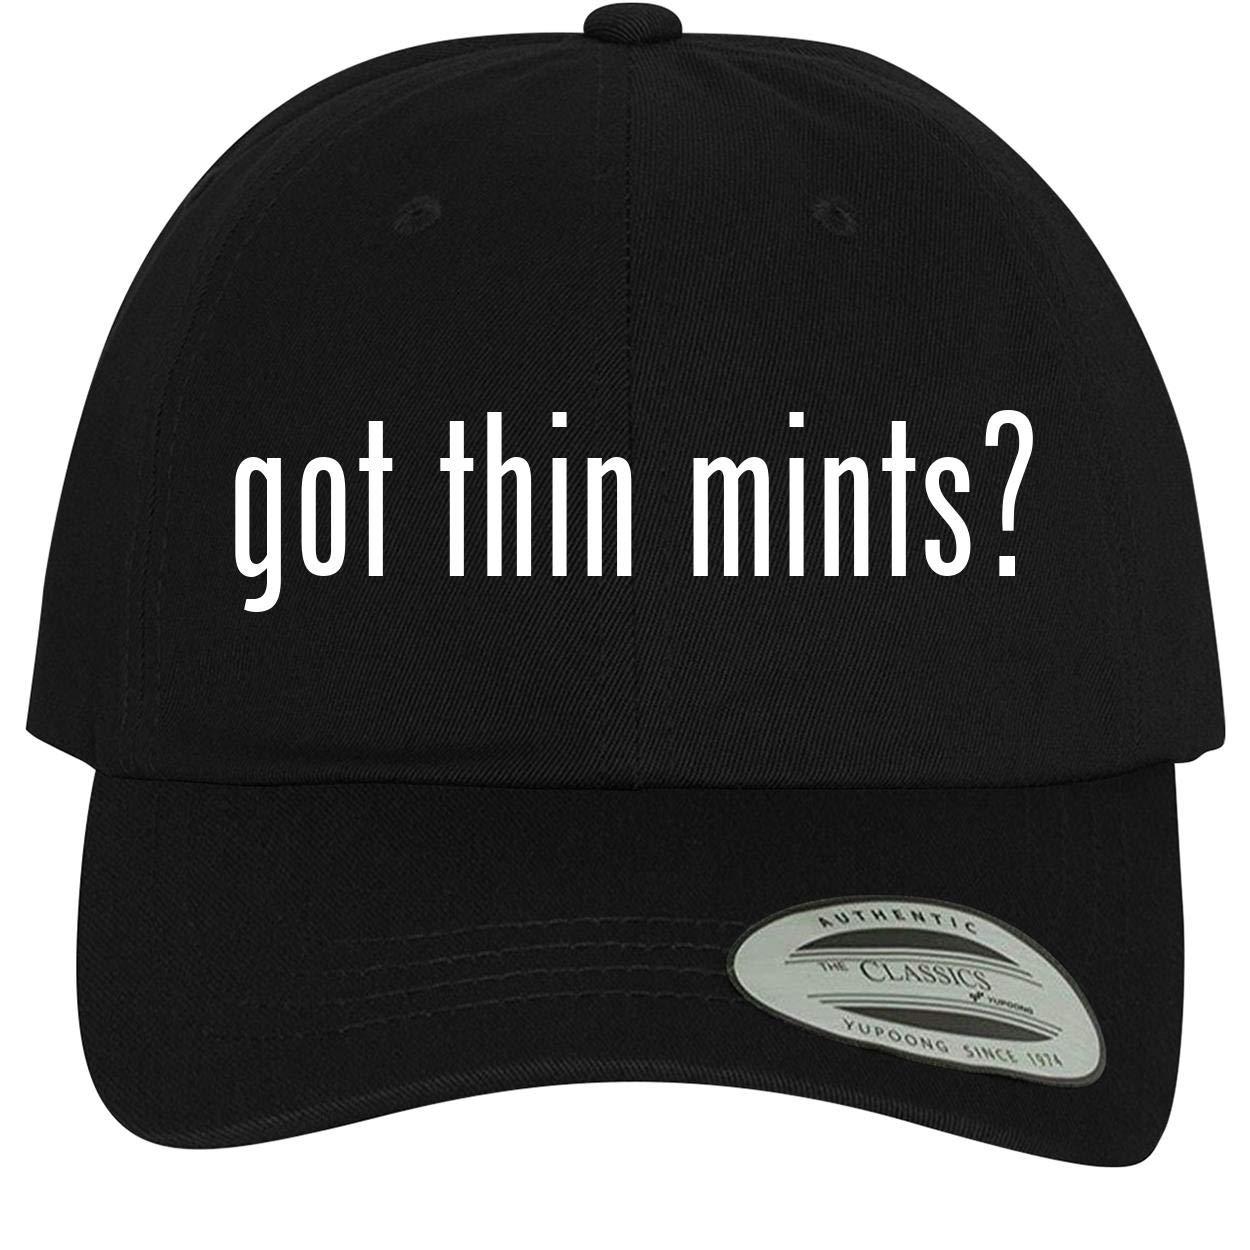 BH Cool Designs got Thin Mints? Comfortable Dad Hat Baseball Cap